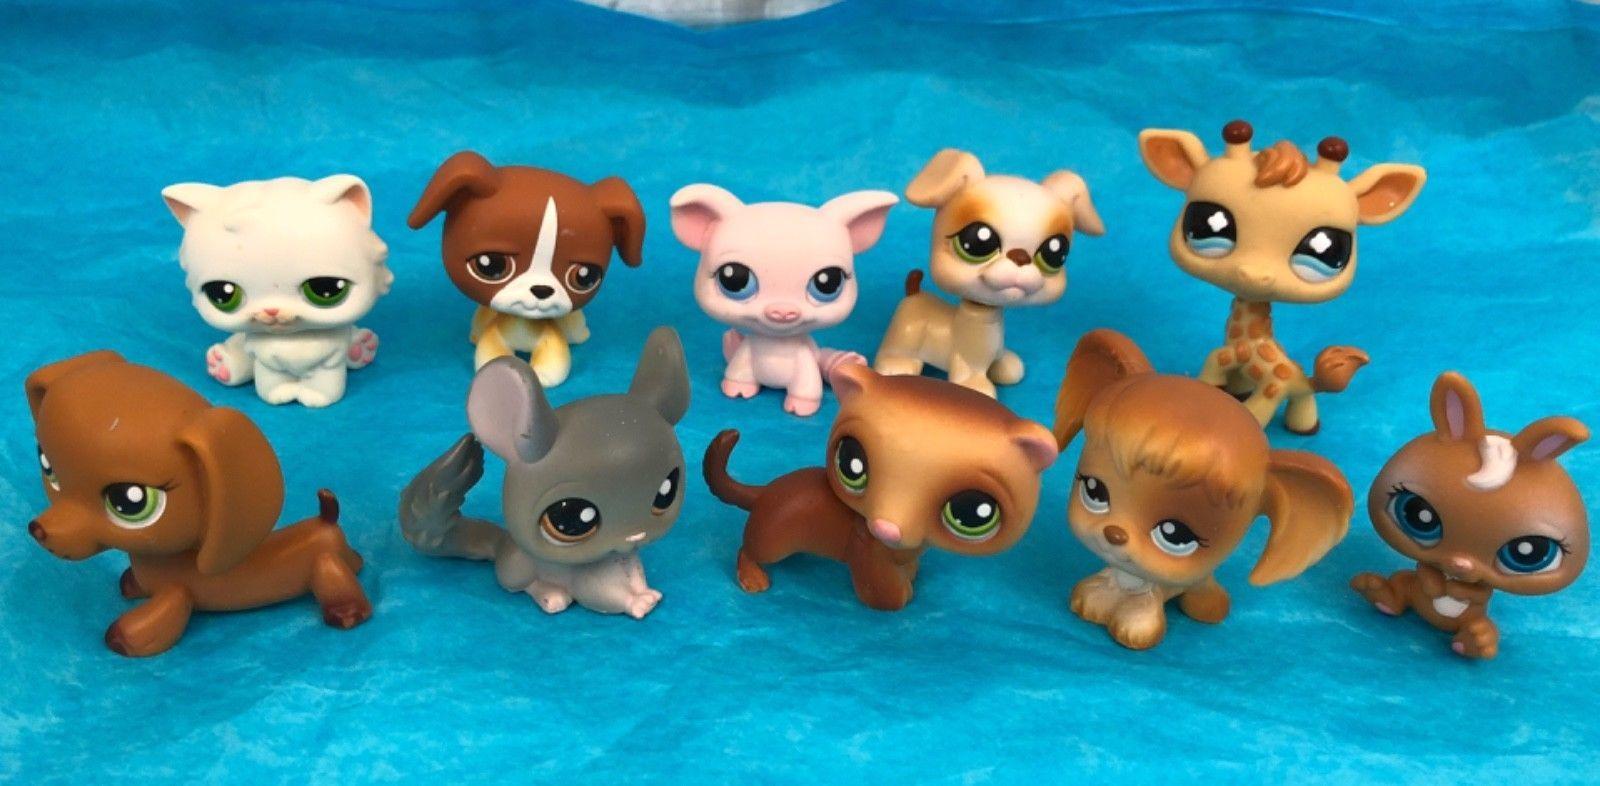 Littlest Pet Shop Lot Of 10 Dachshund Pig Bunny Puppy